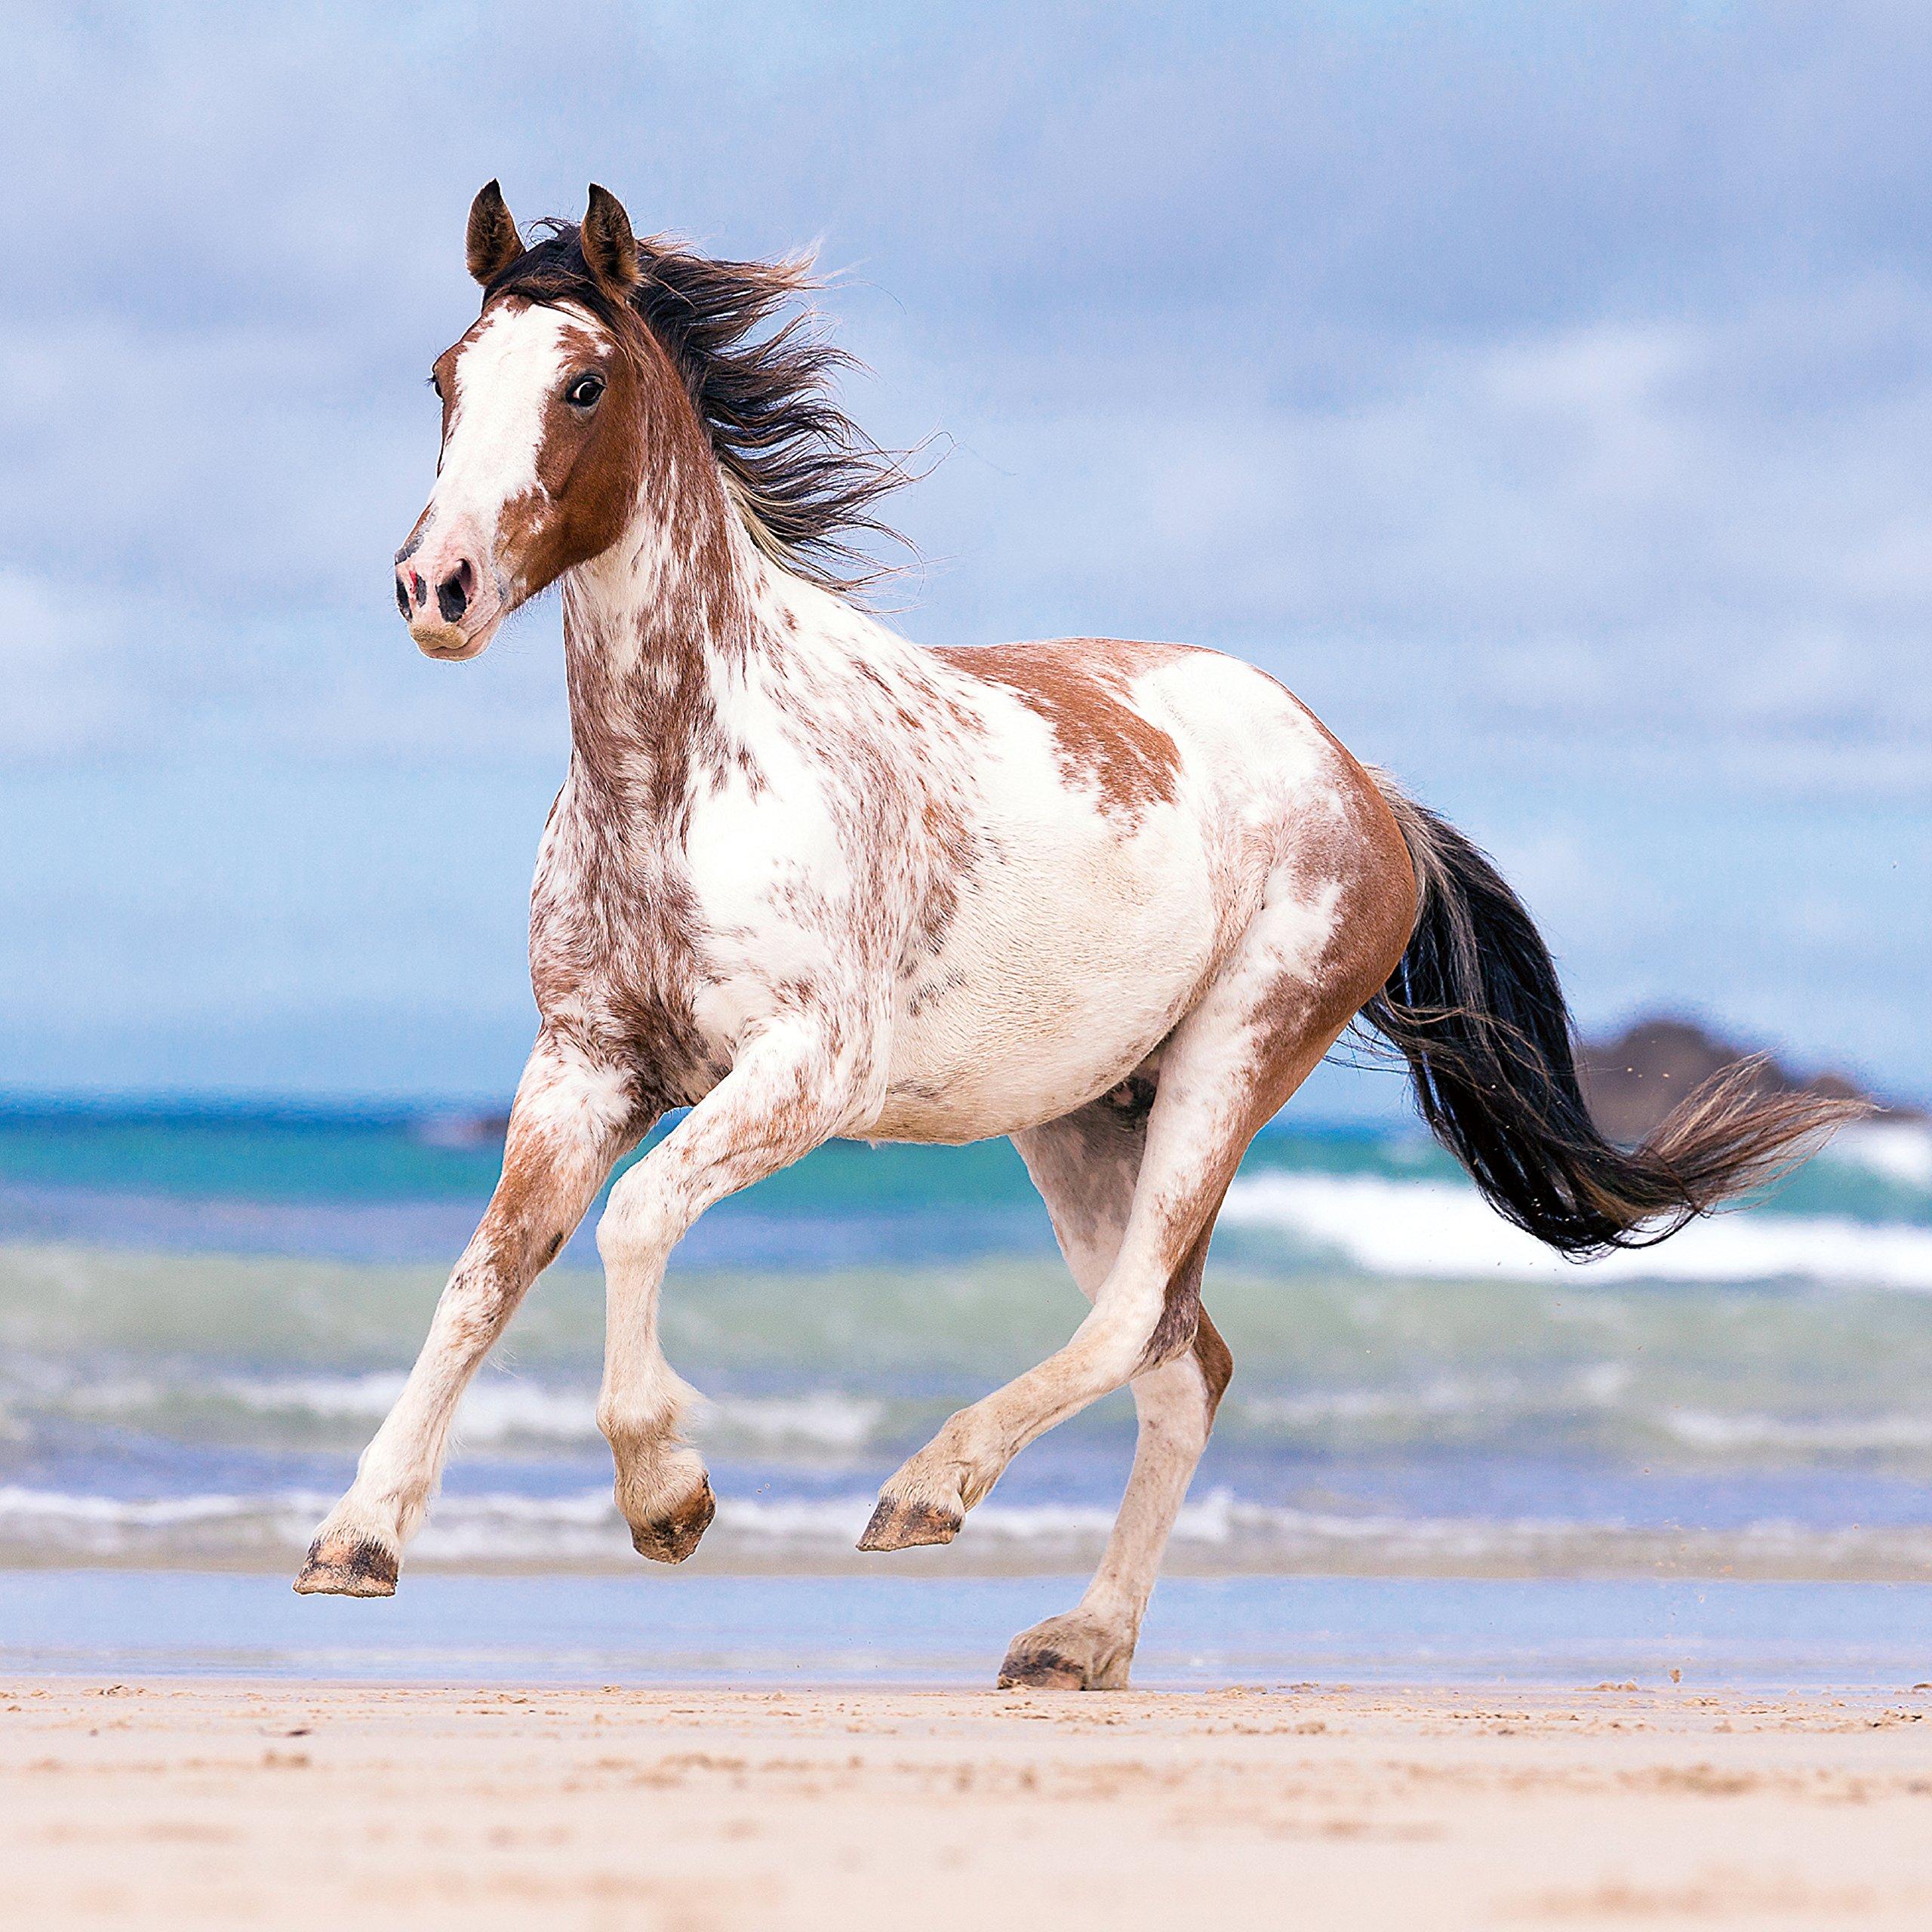 mein pferdekalender 2017 broschurenkalender 30 x 60 geoffnet tierkalender wandplaner